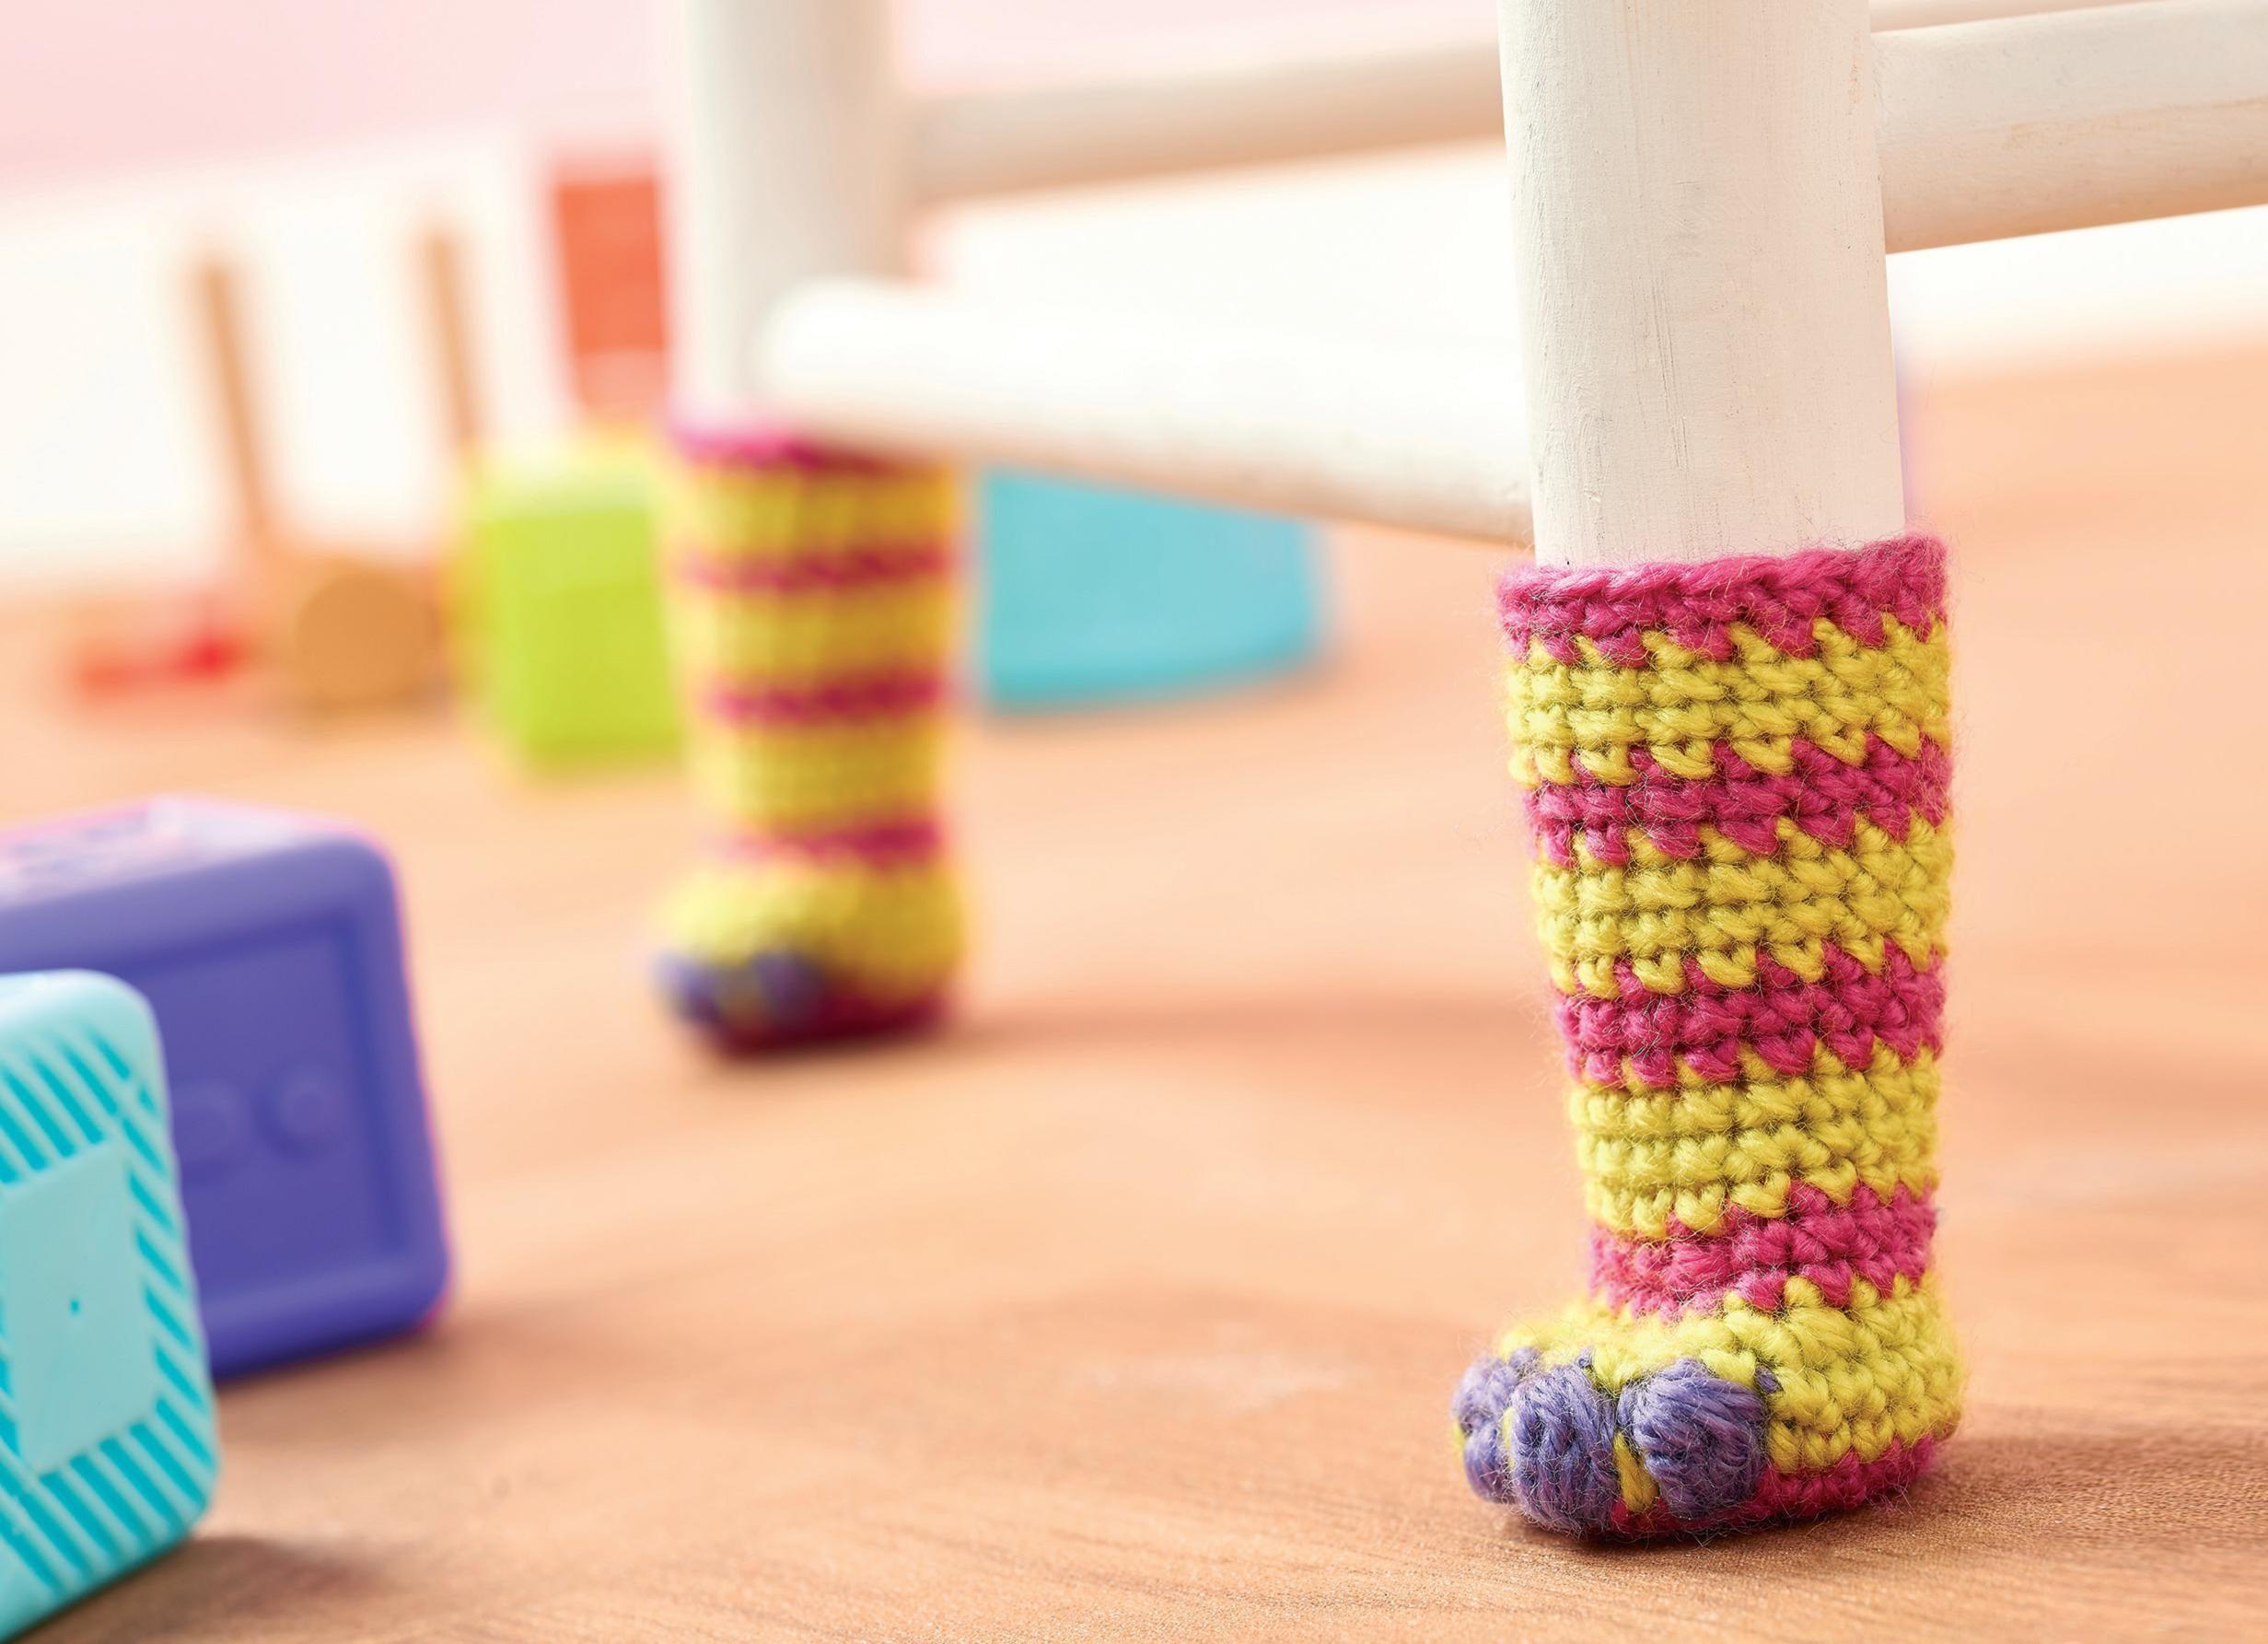 Chair Socks Crochet Pattern Chair Socks Pattern Chair Socks Free Crochet Pattern